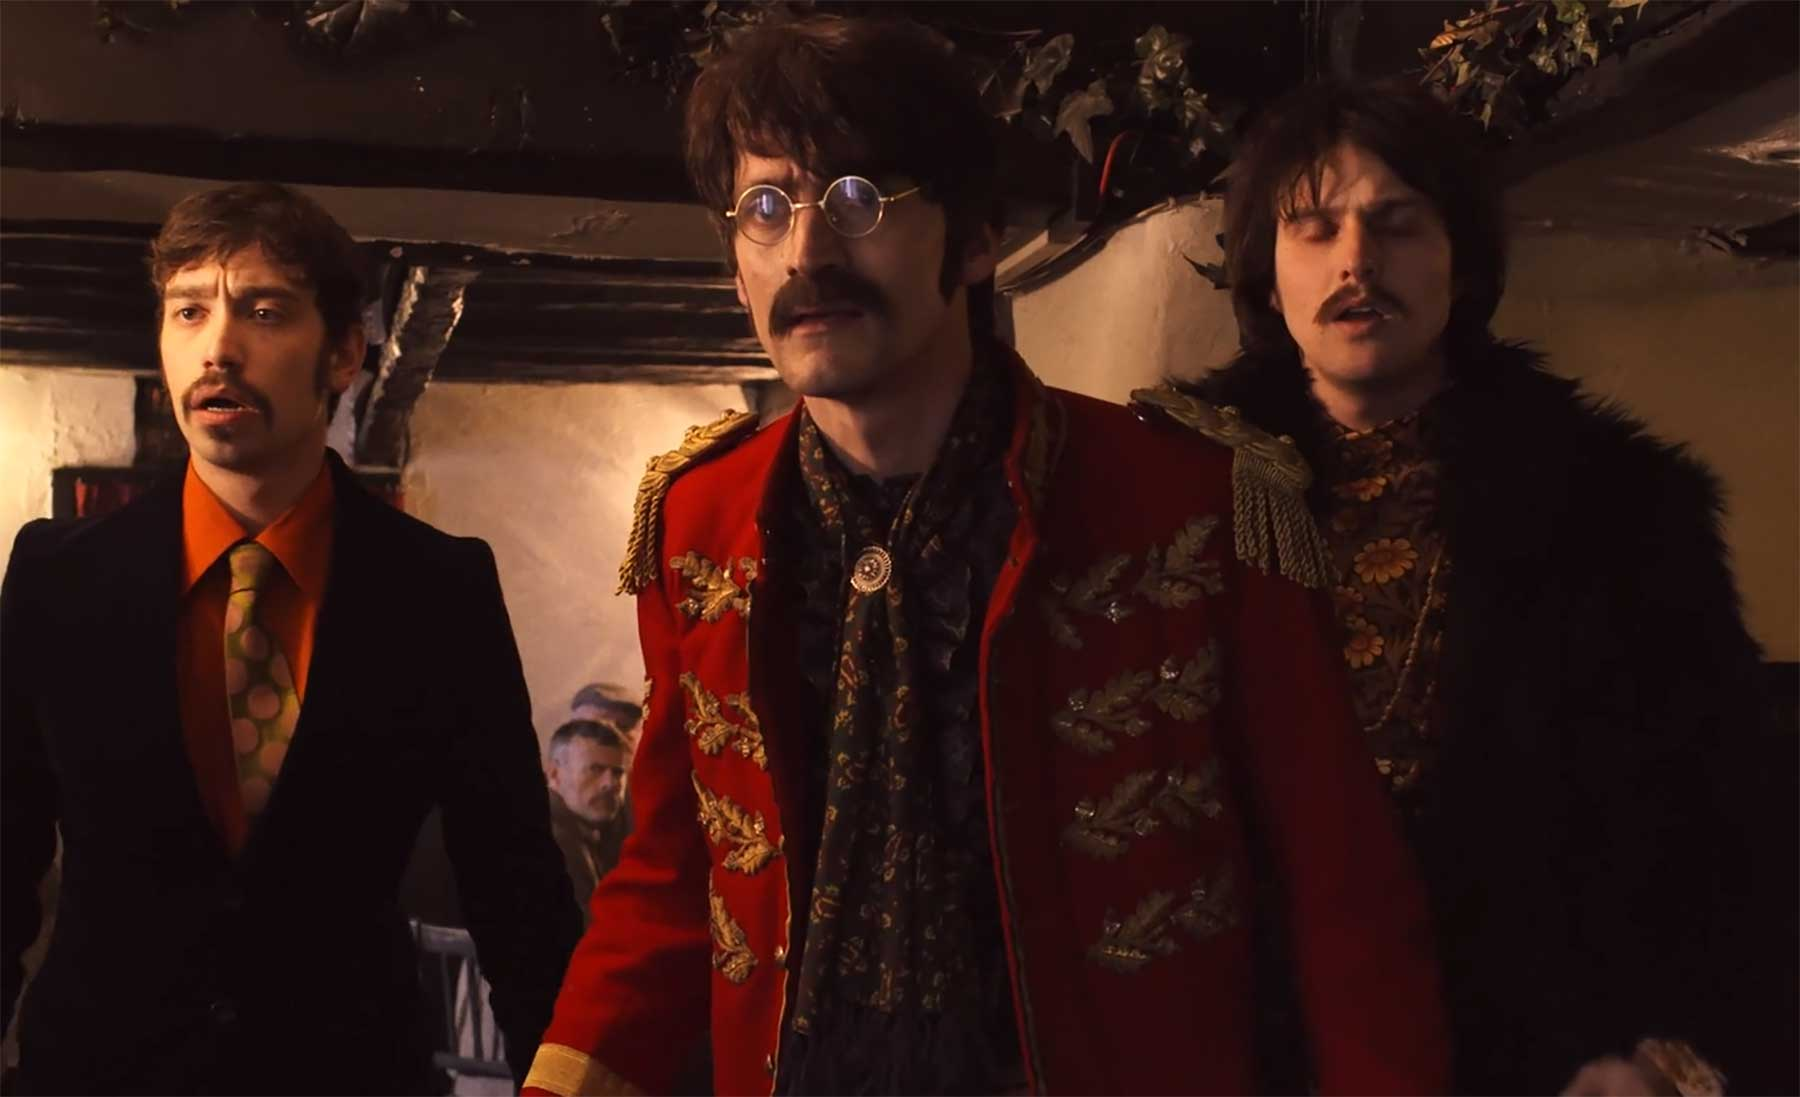 Wenn Paul McCartney als einziger Beatle verstorben wäre